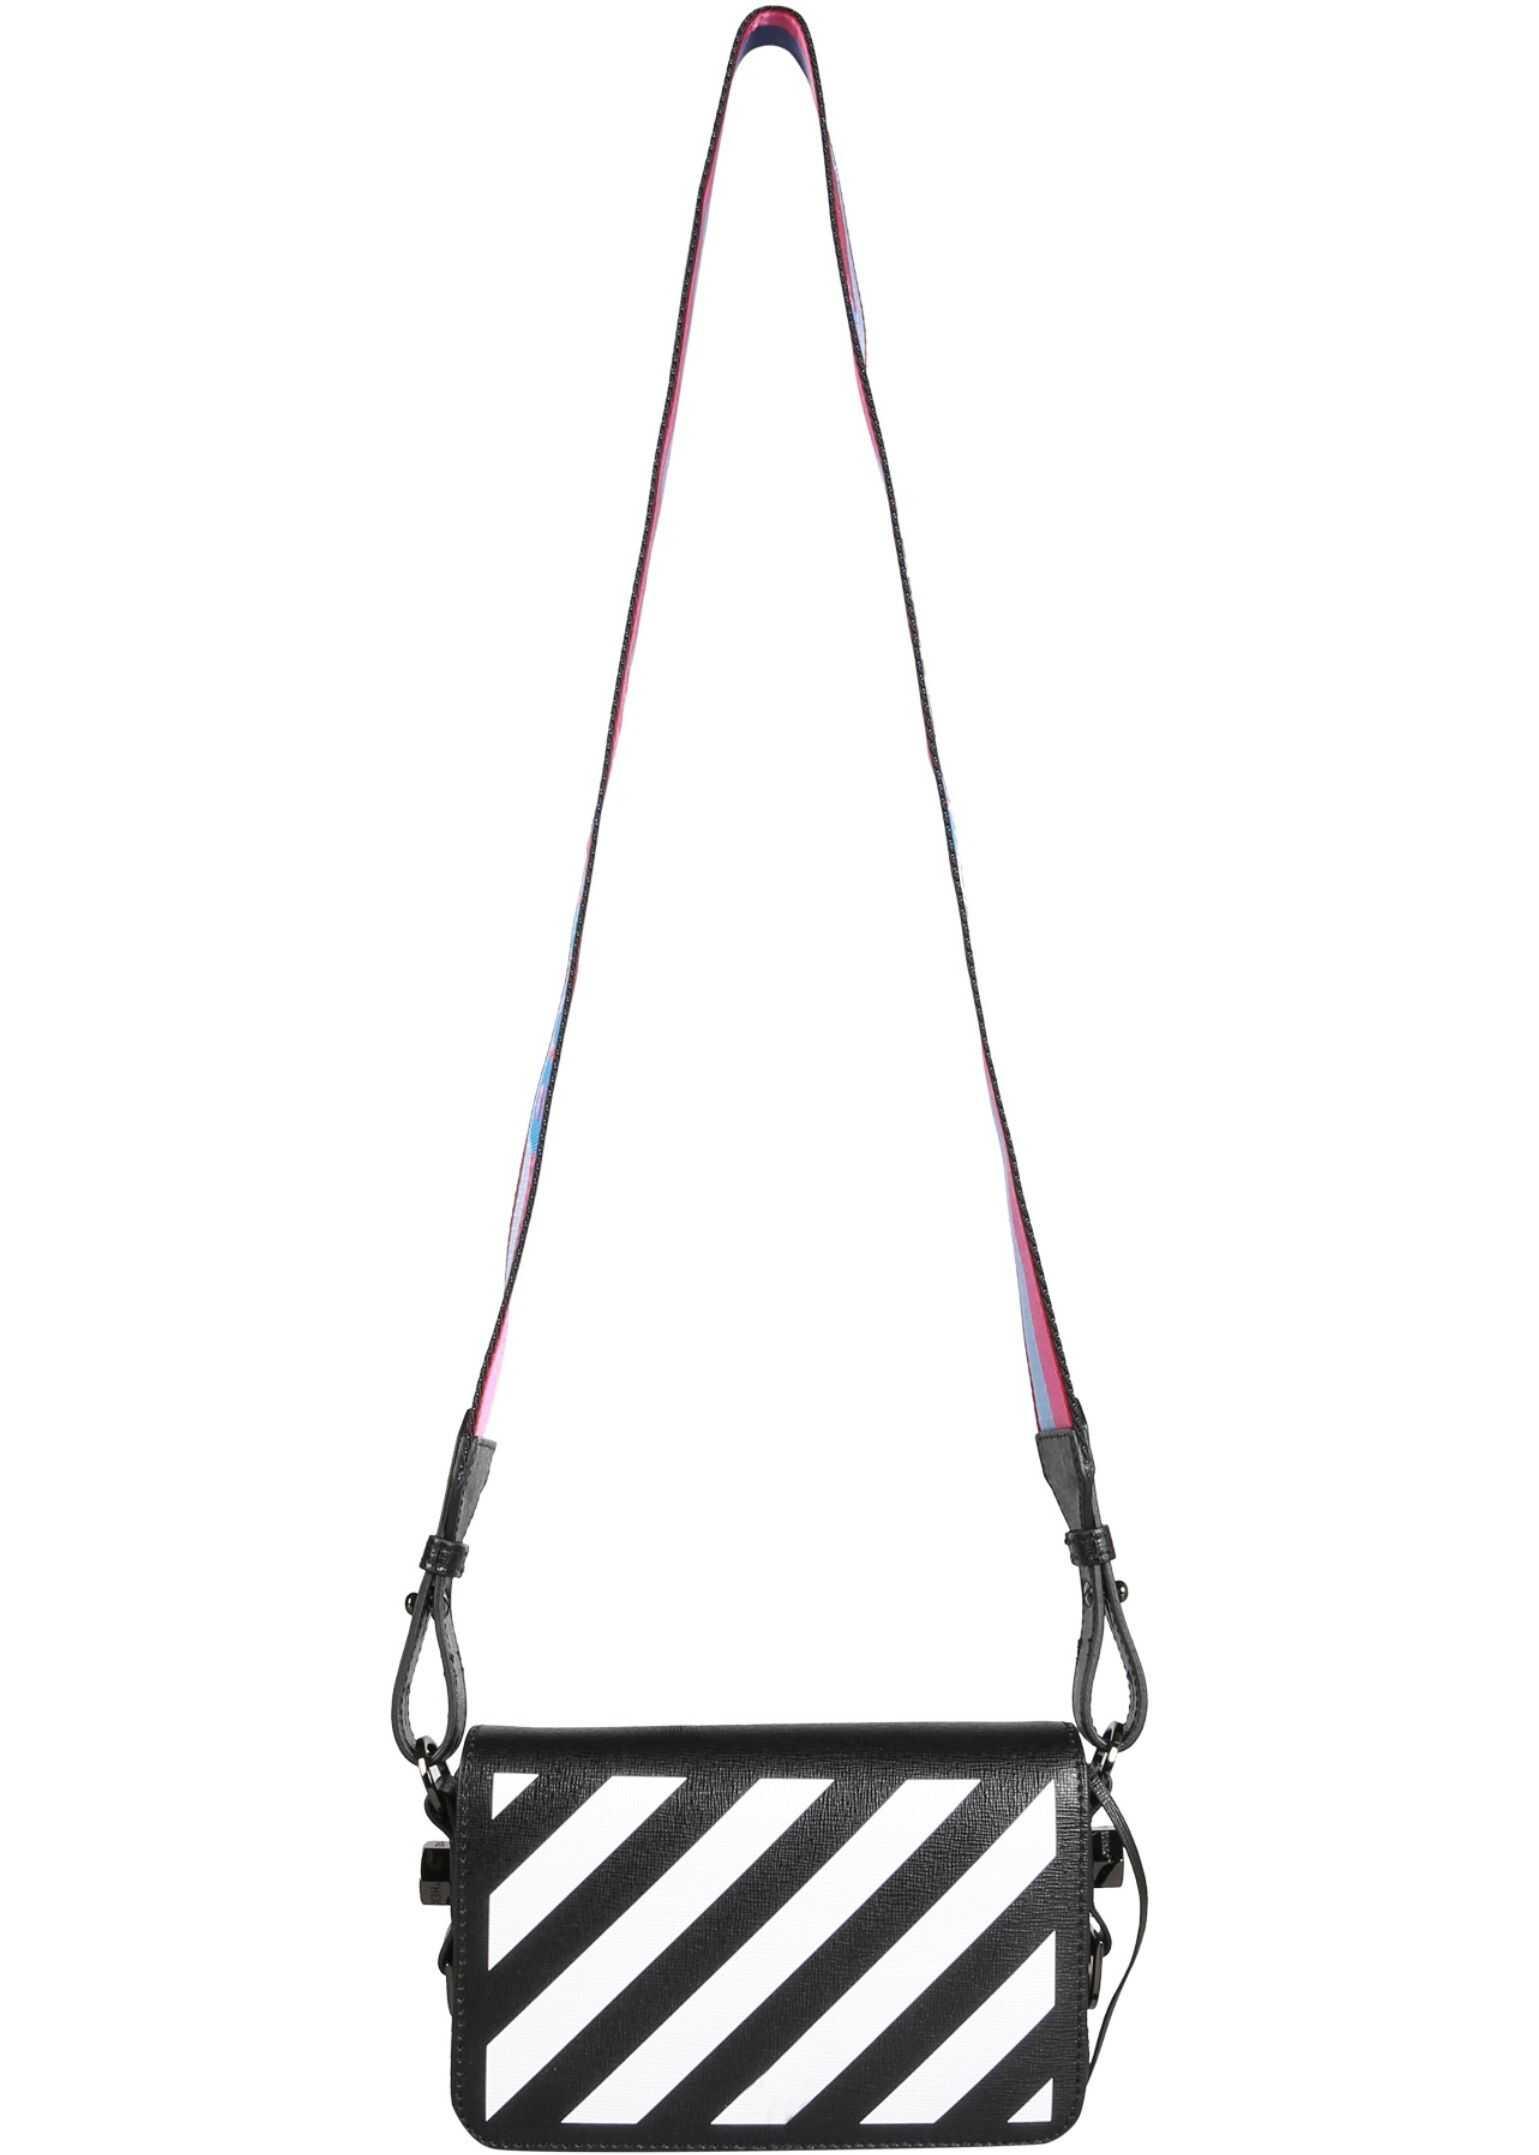 Off-White Mini Leather Bag OWNA038_R21LEA0011001 BLACK imagine b-mall.ro